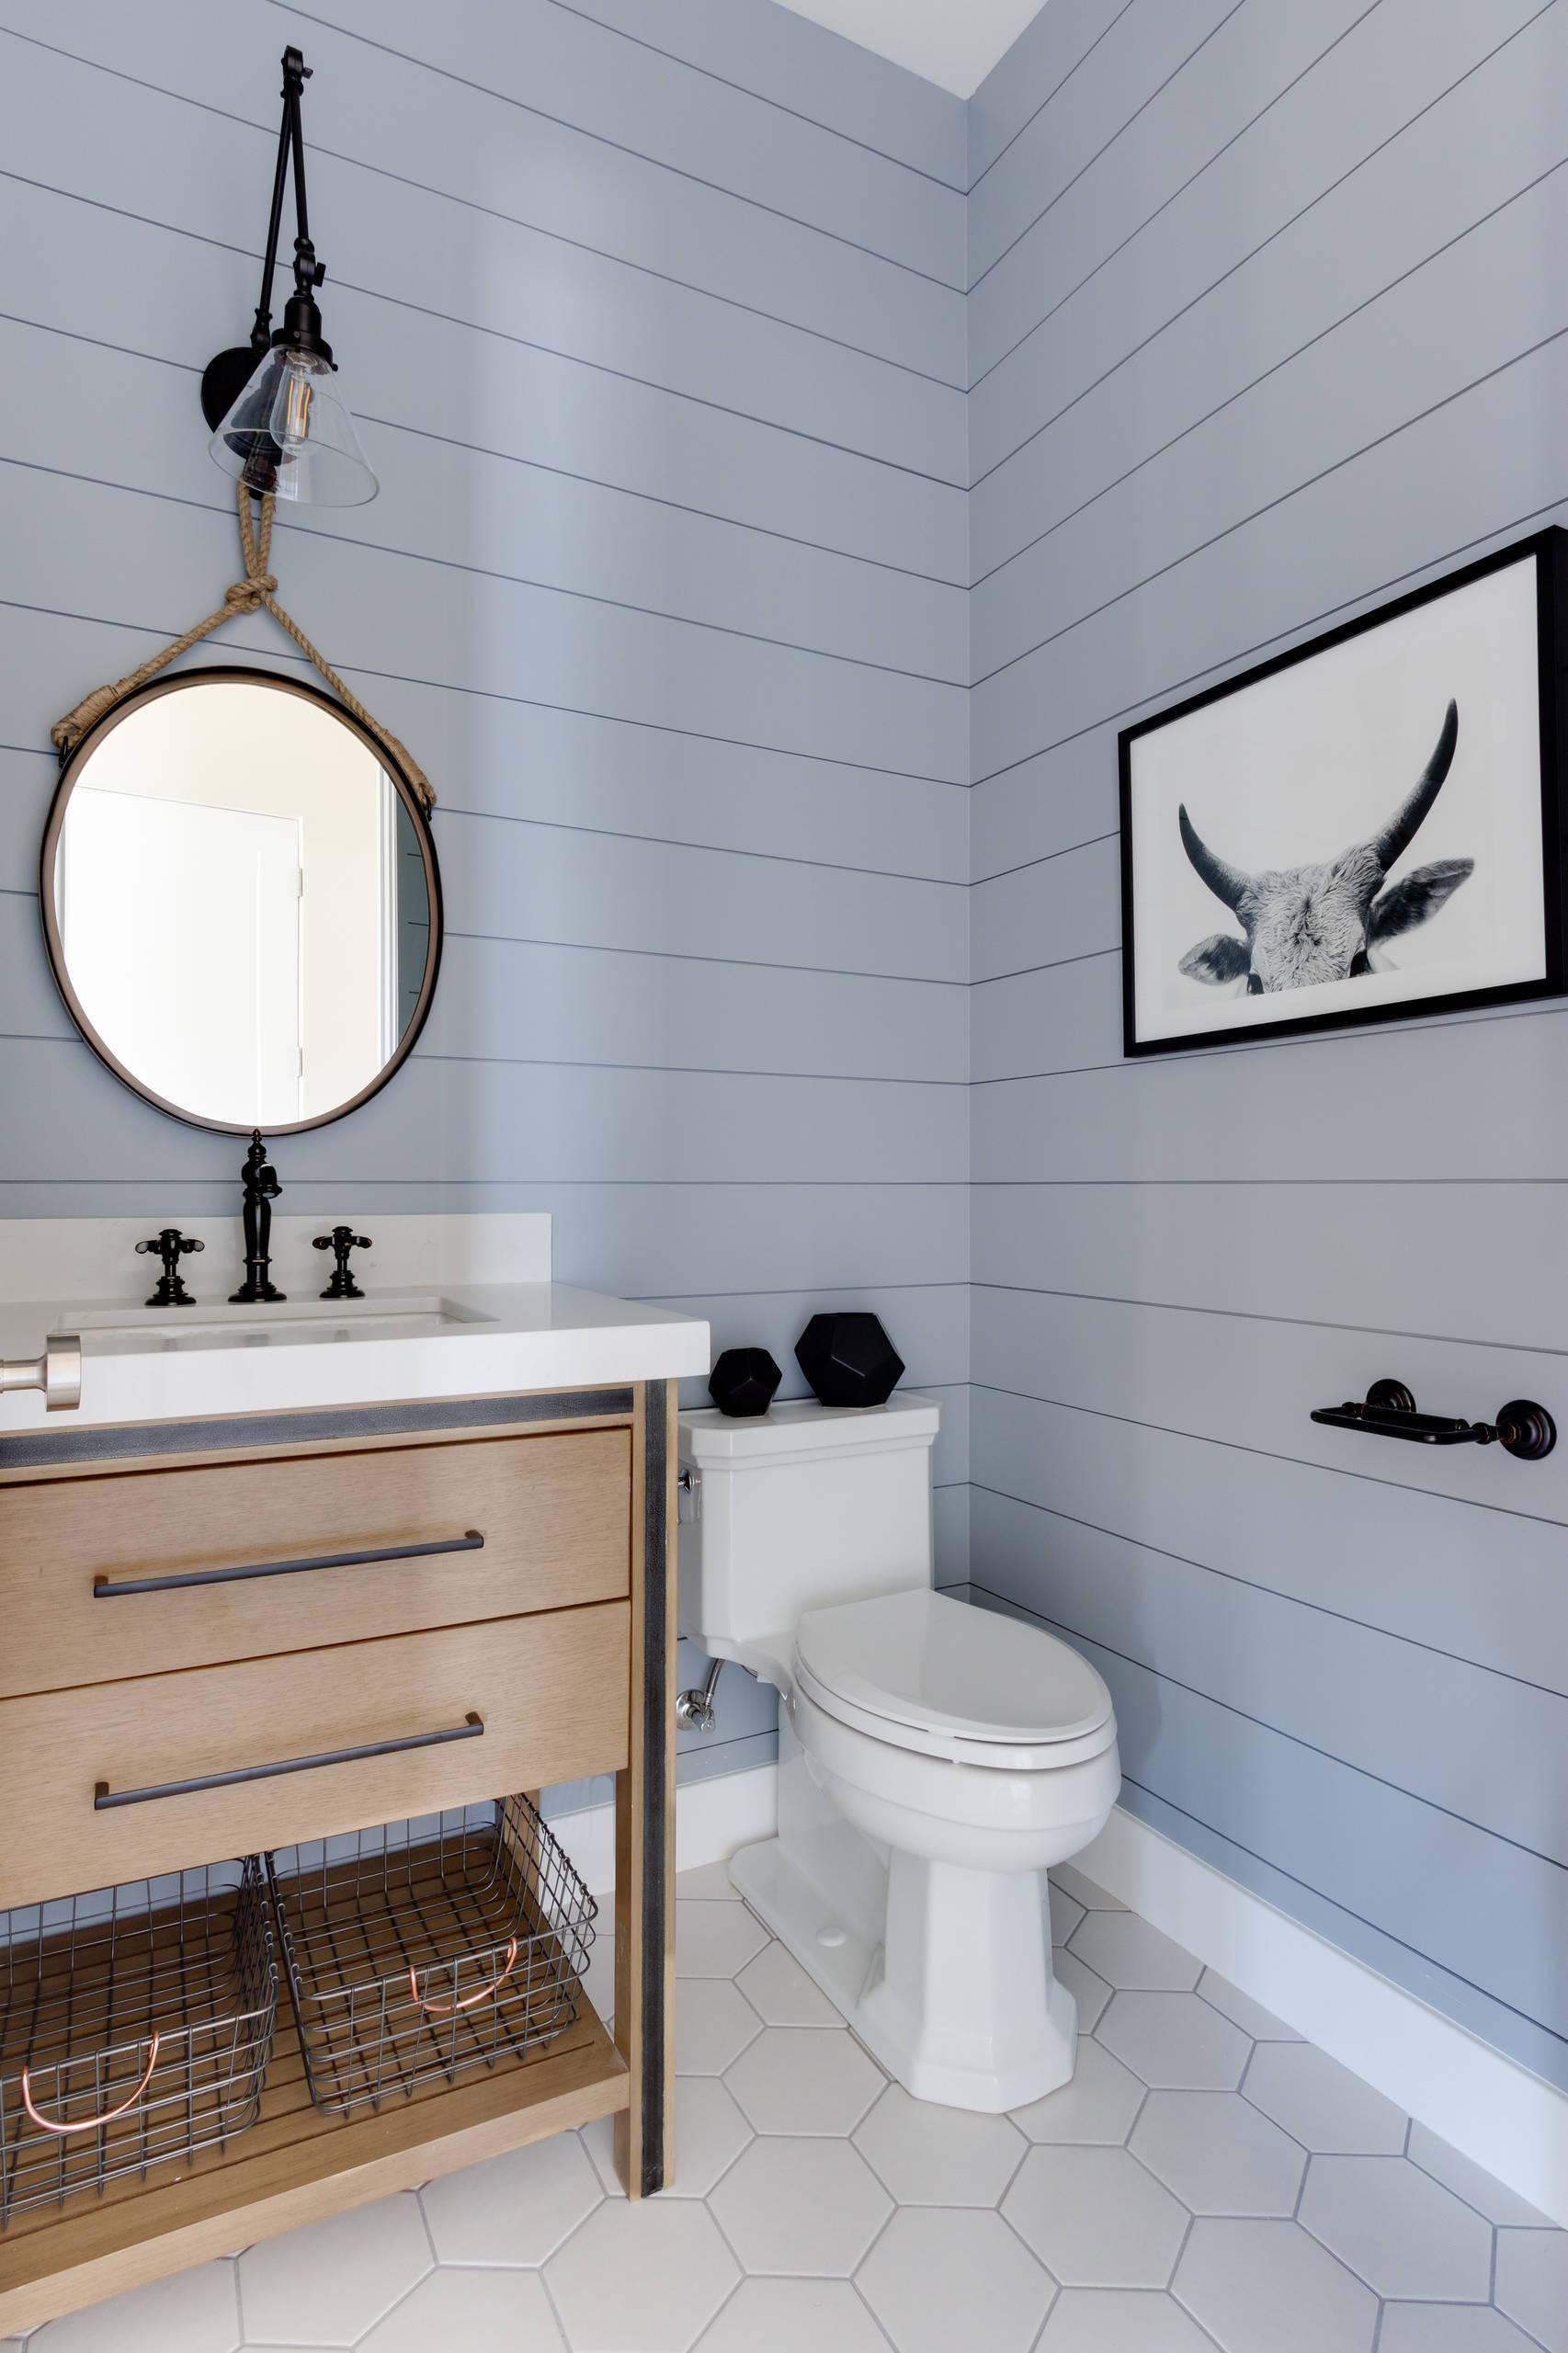 75 Beautiful Farmhouse Powder Room Pictures Ideas February 2021 Houzz